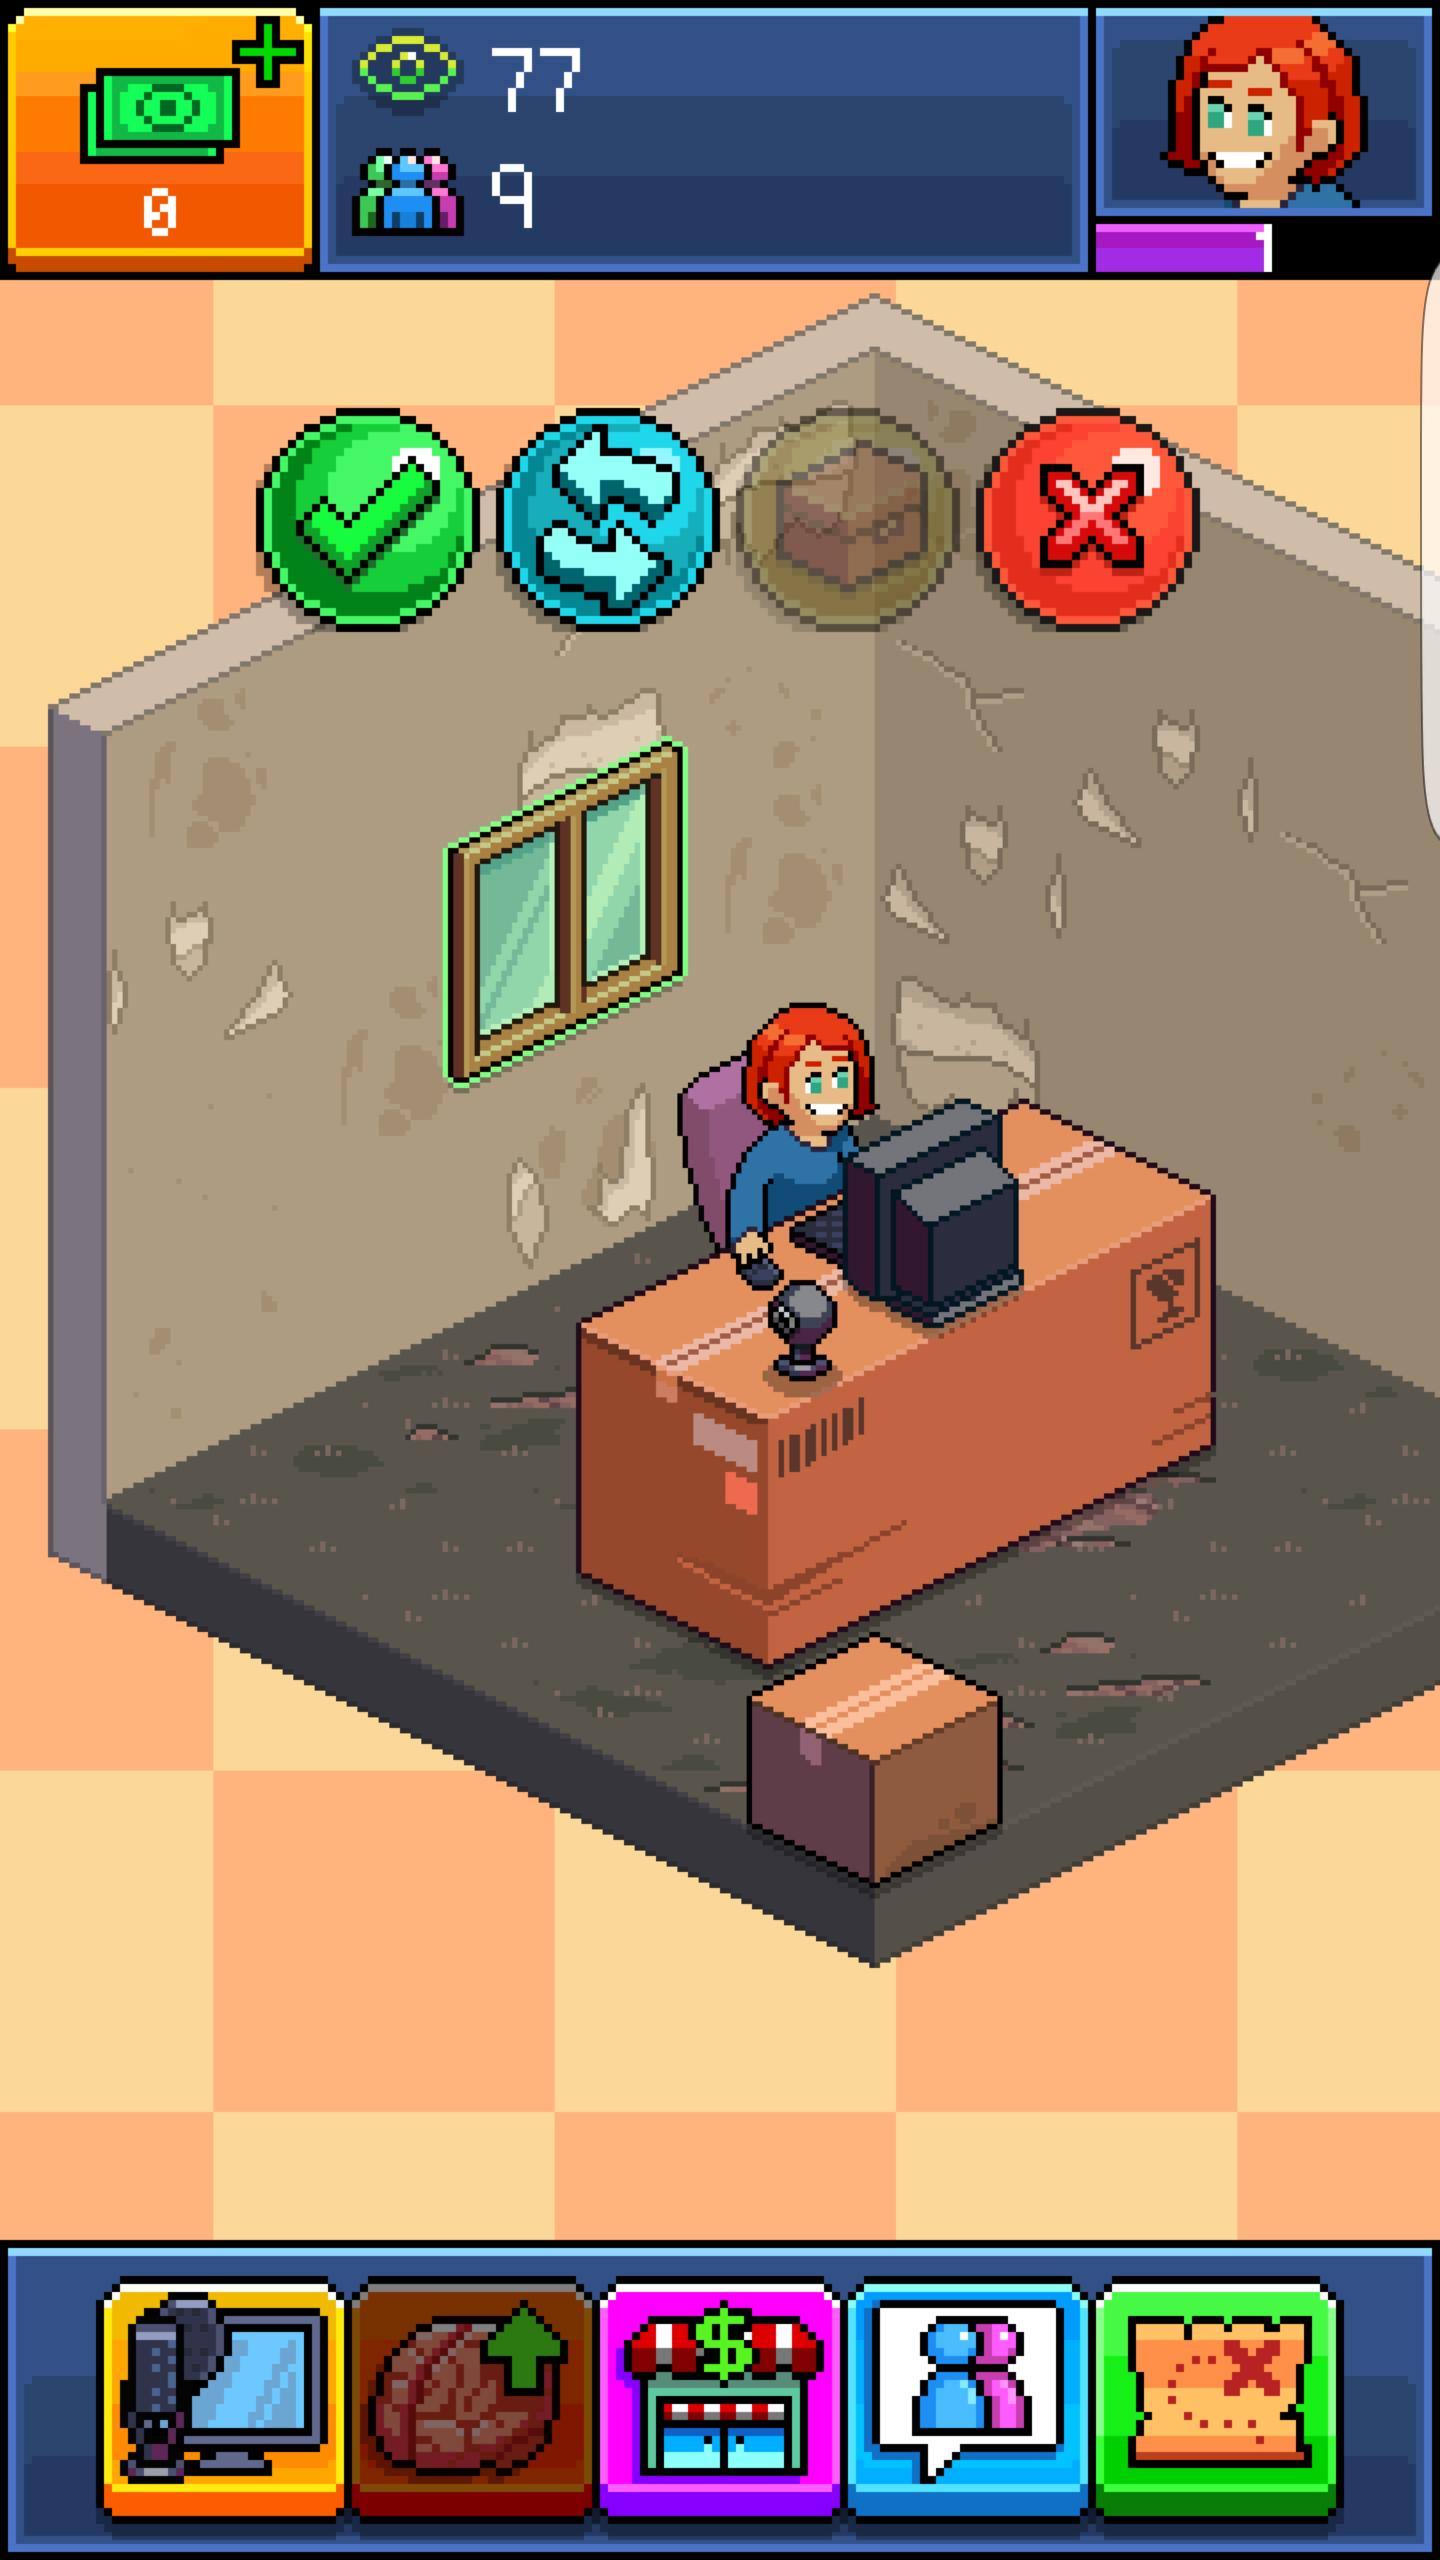 pewdiepies-tuber-simulator-android-4